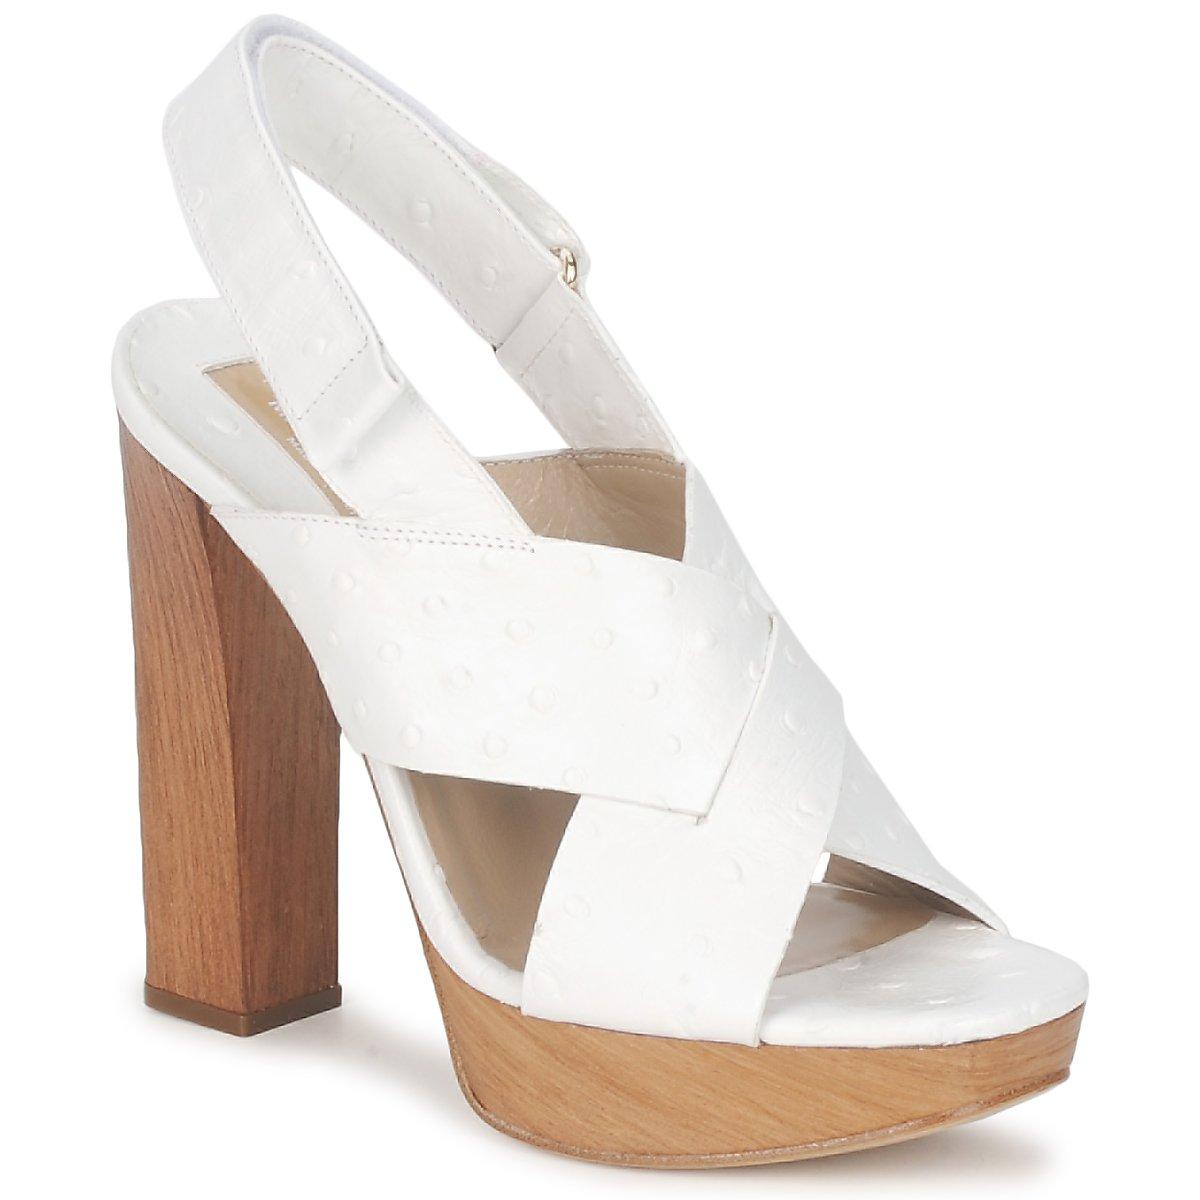 Sandale Michael Kors MK18072 Blanc